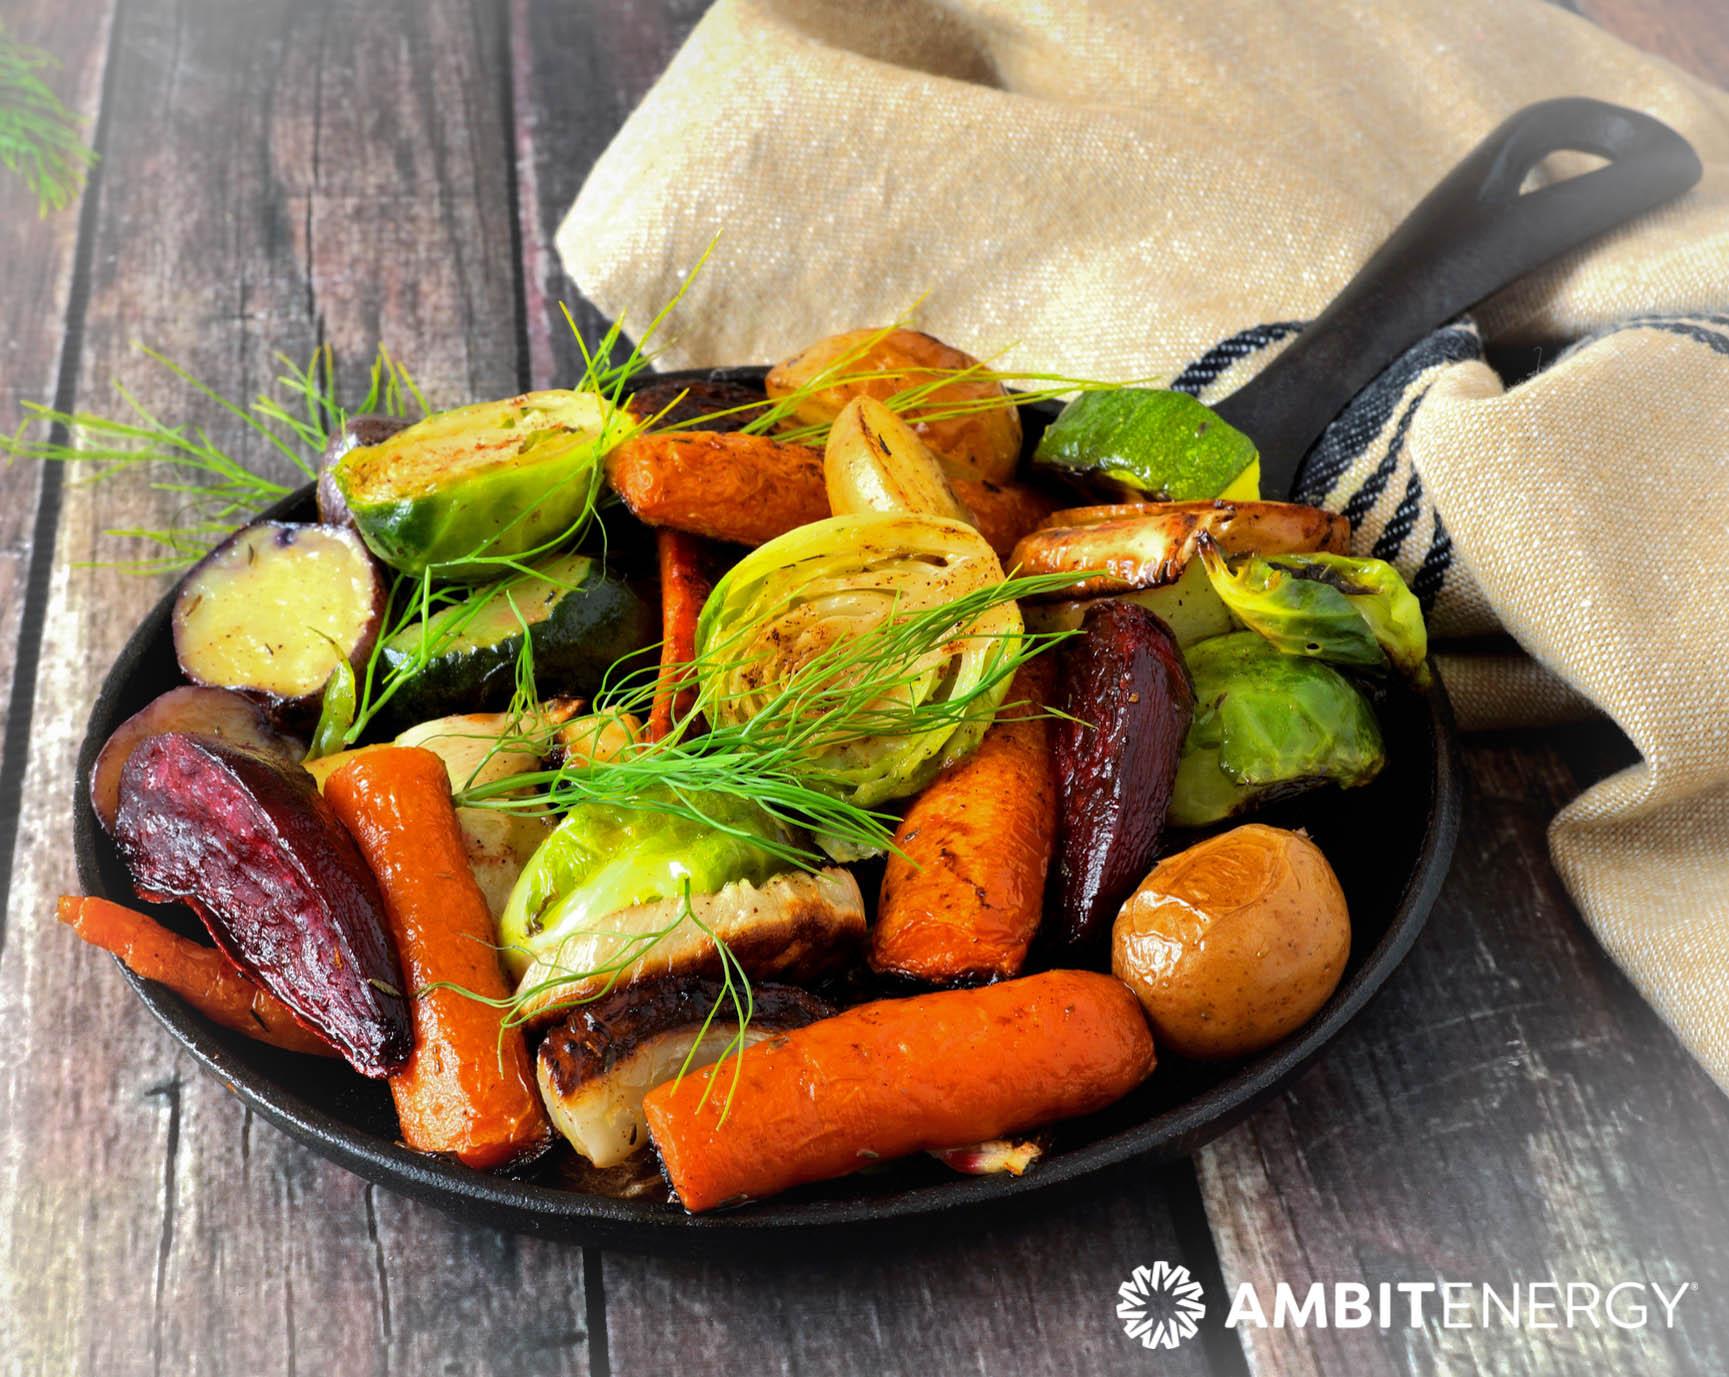 Ambit Reviews: Energy Efficient Cooking